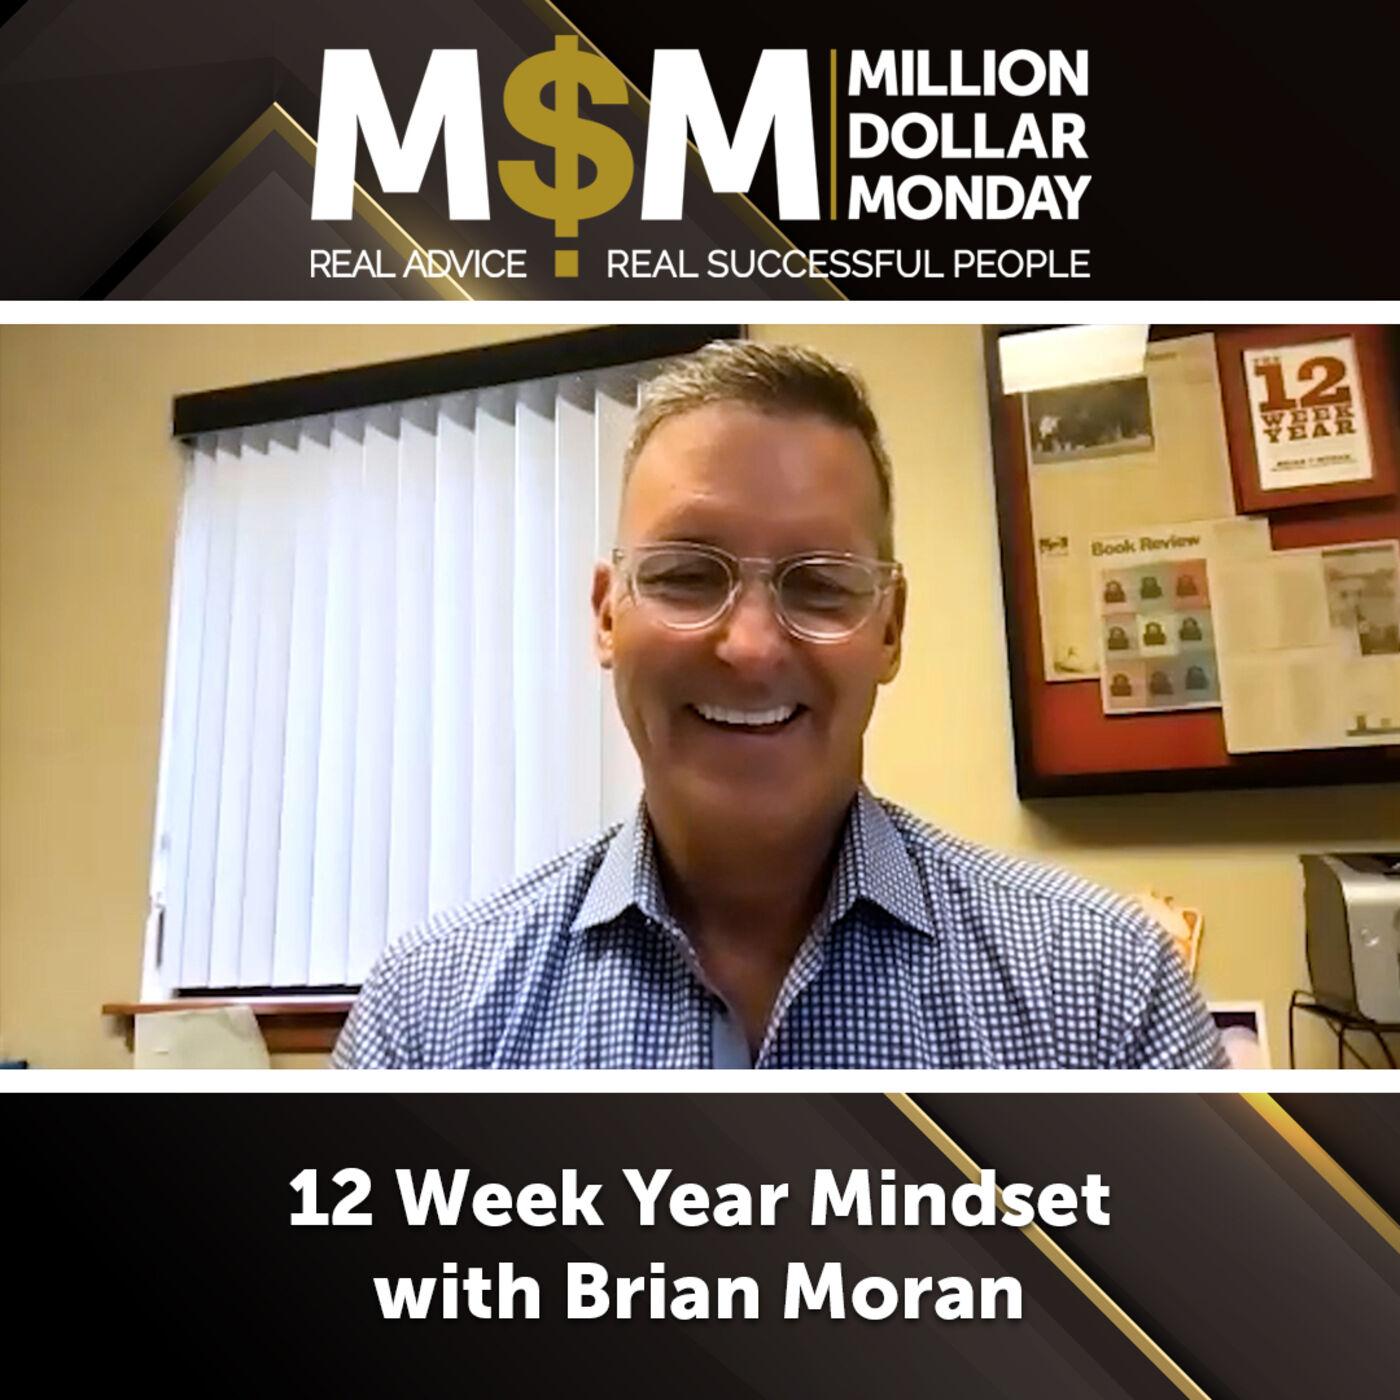 12 Week Year Mindset with Brian Moran